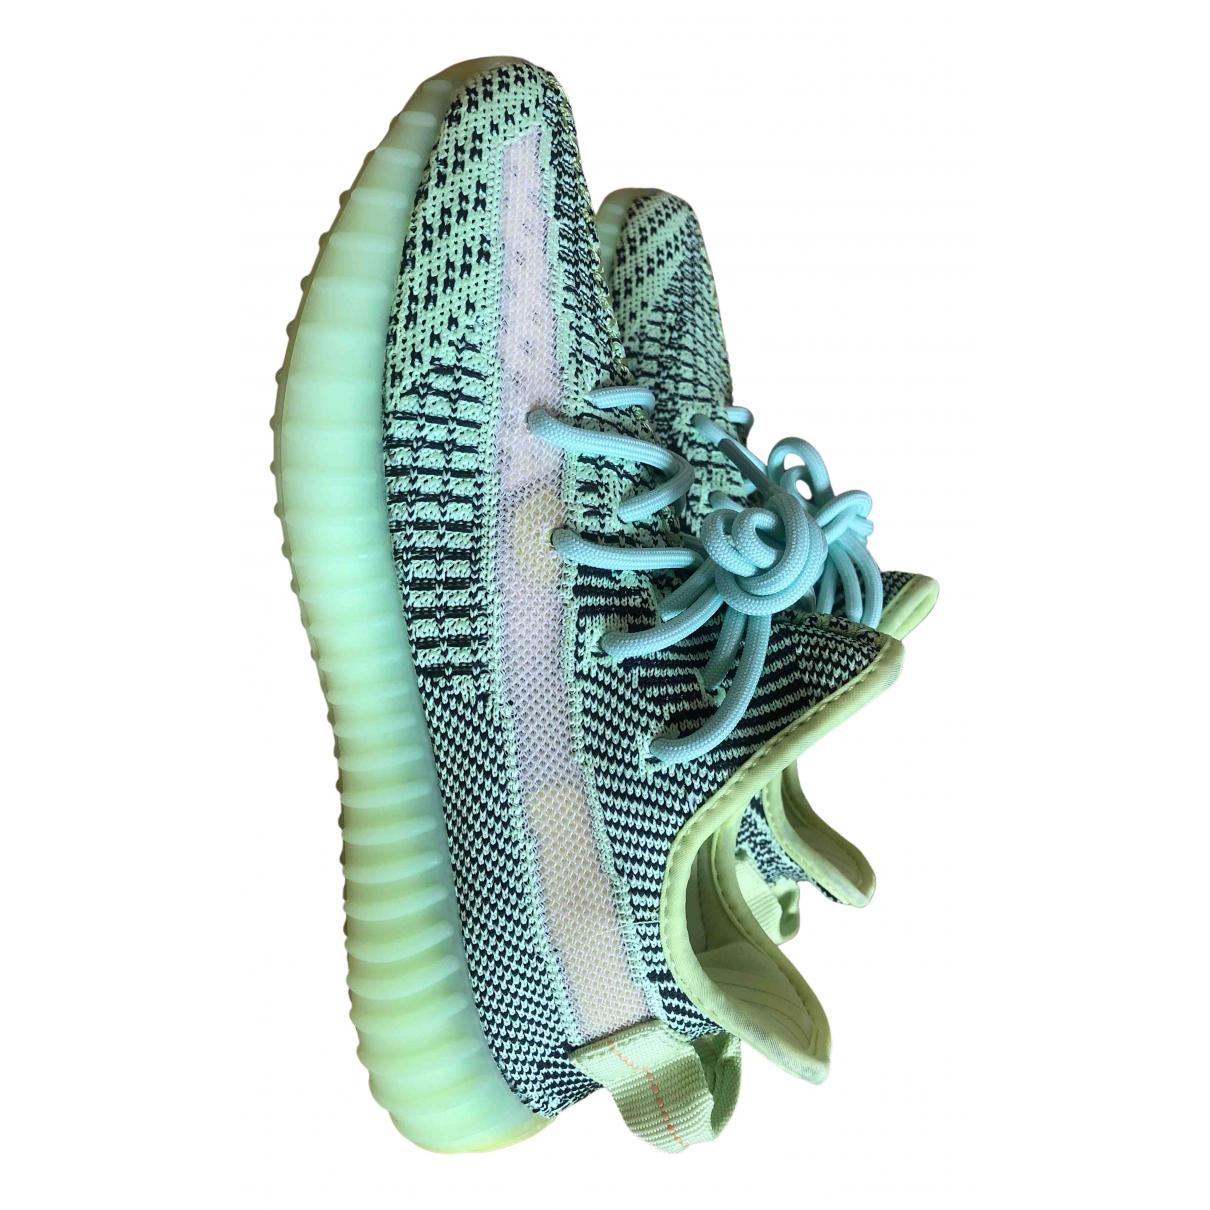 Yeezy X Adidas - Baskets Boost 350 V2 pour femme en toile